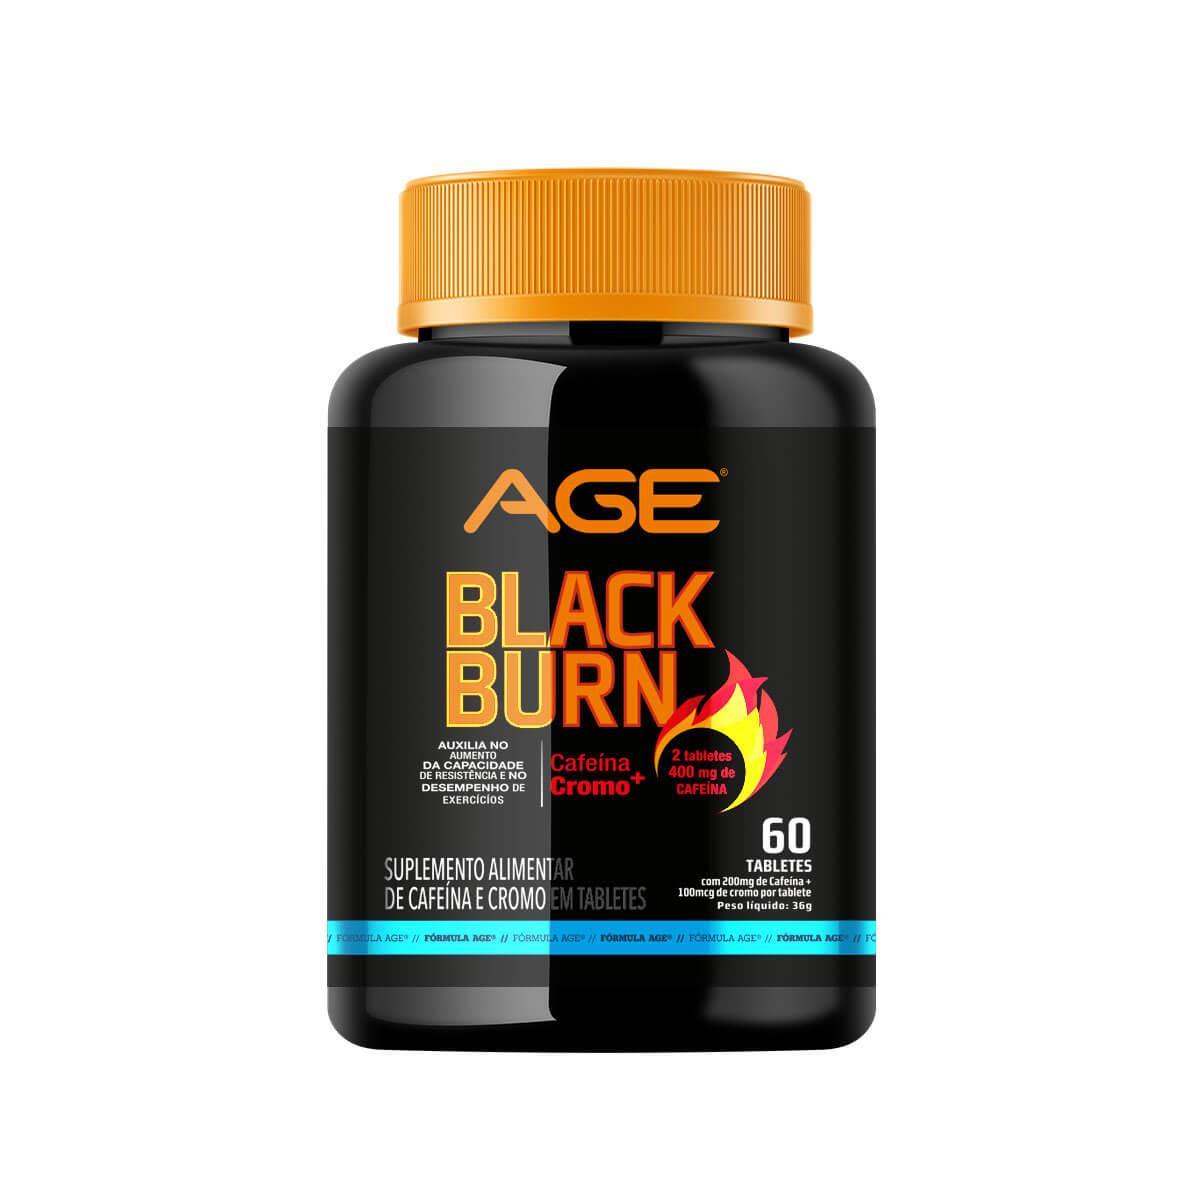 BLACK BURN INTENSE TERMOGÊNICO (60 Tabletes) - AGE